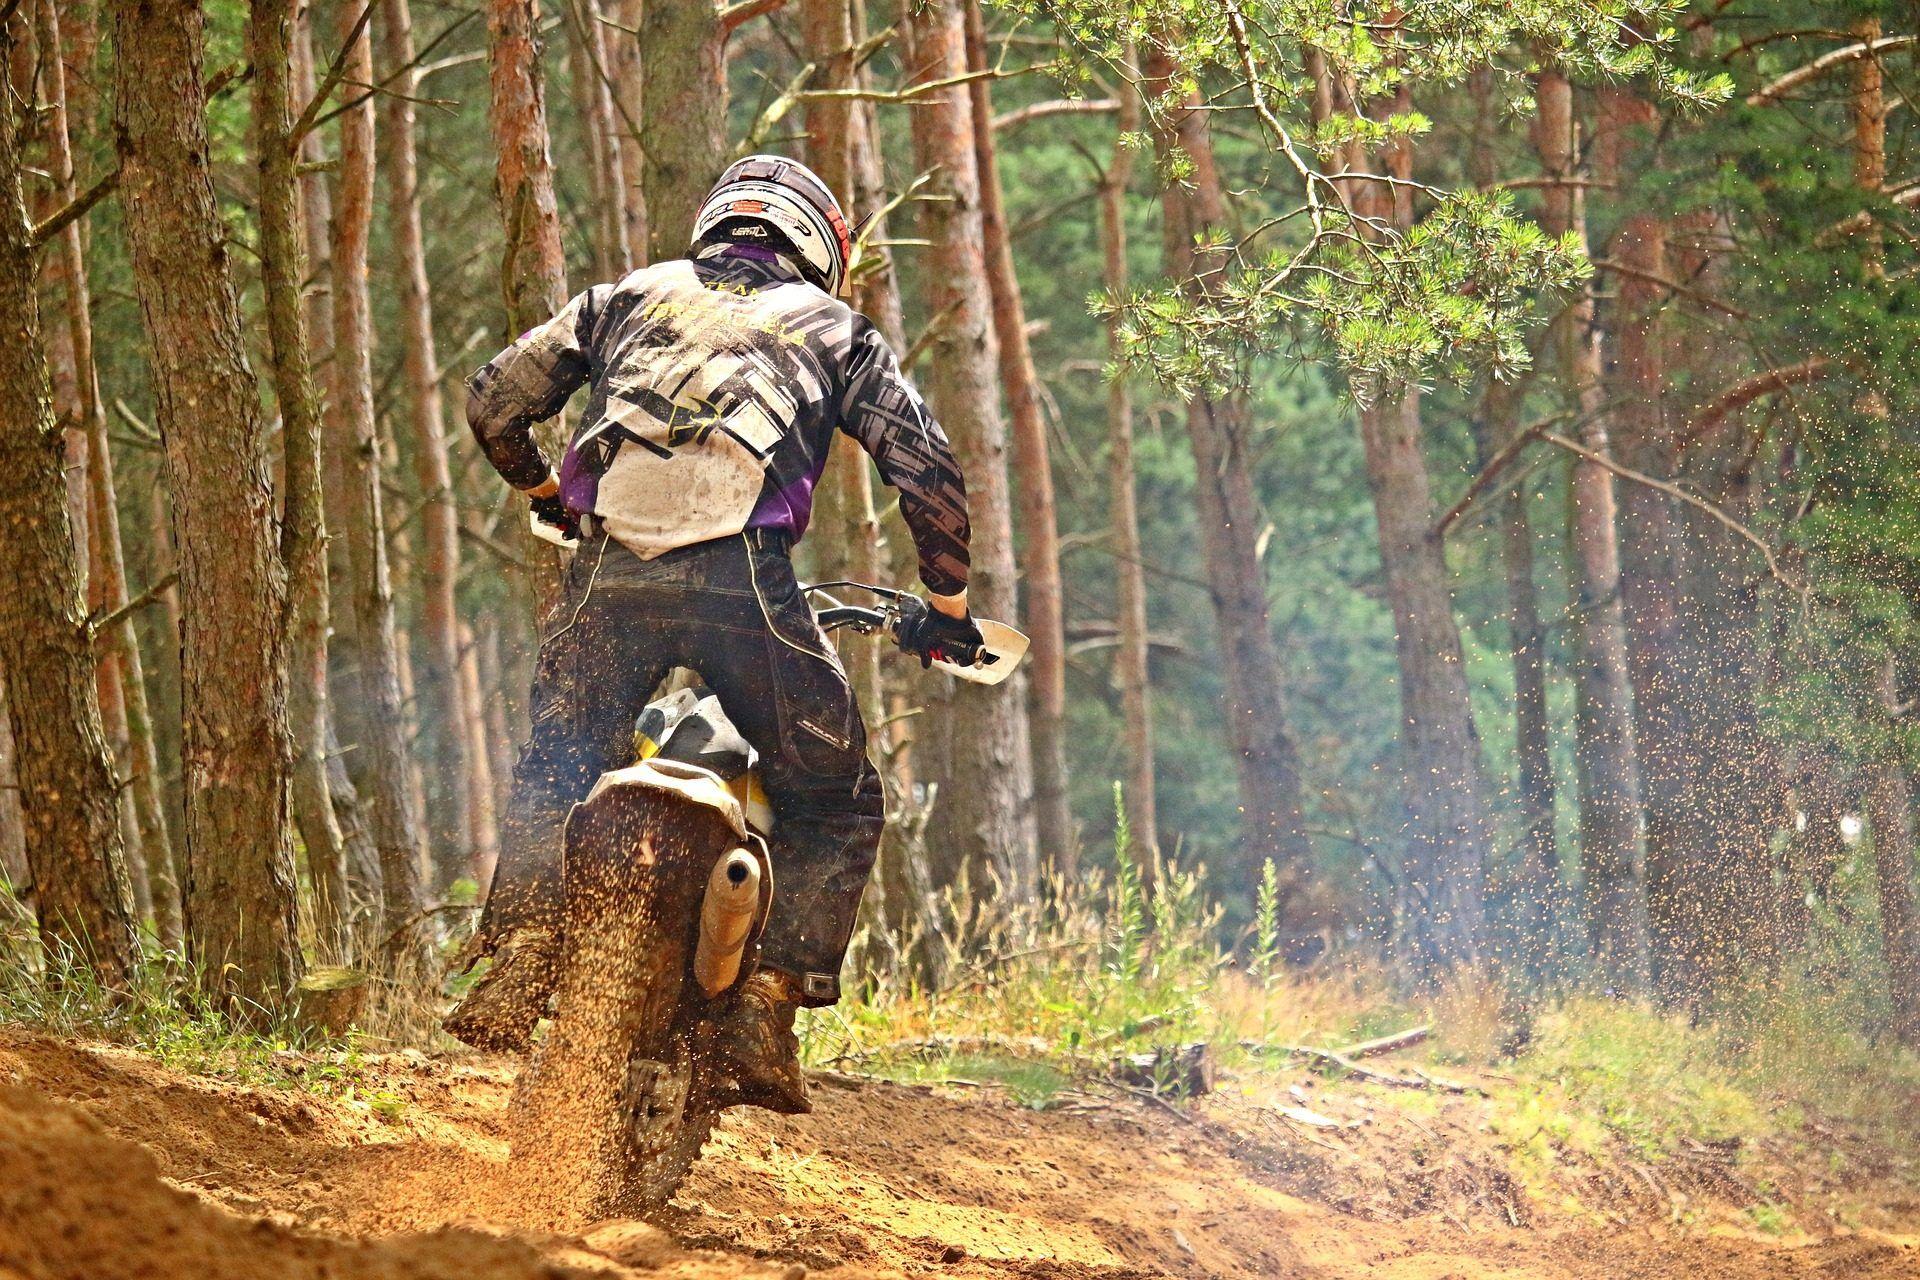 Excelente Constructor De Currículums De Motocross Ornamento ...